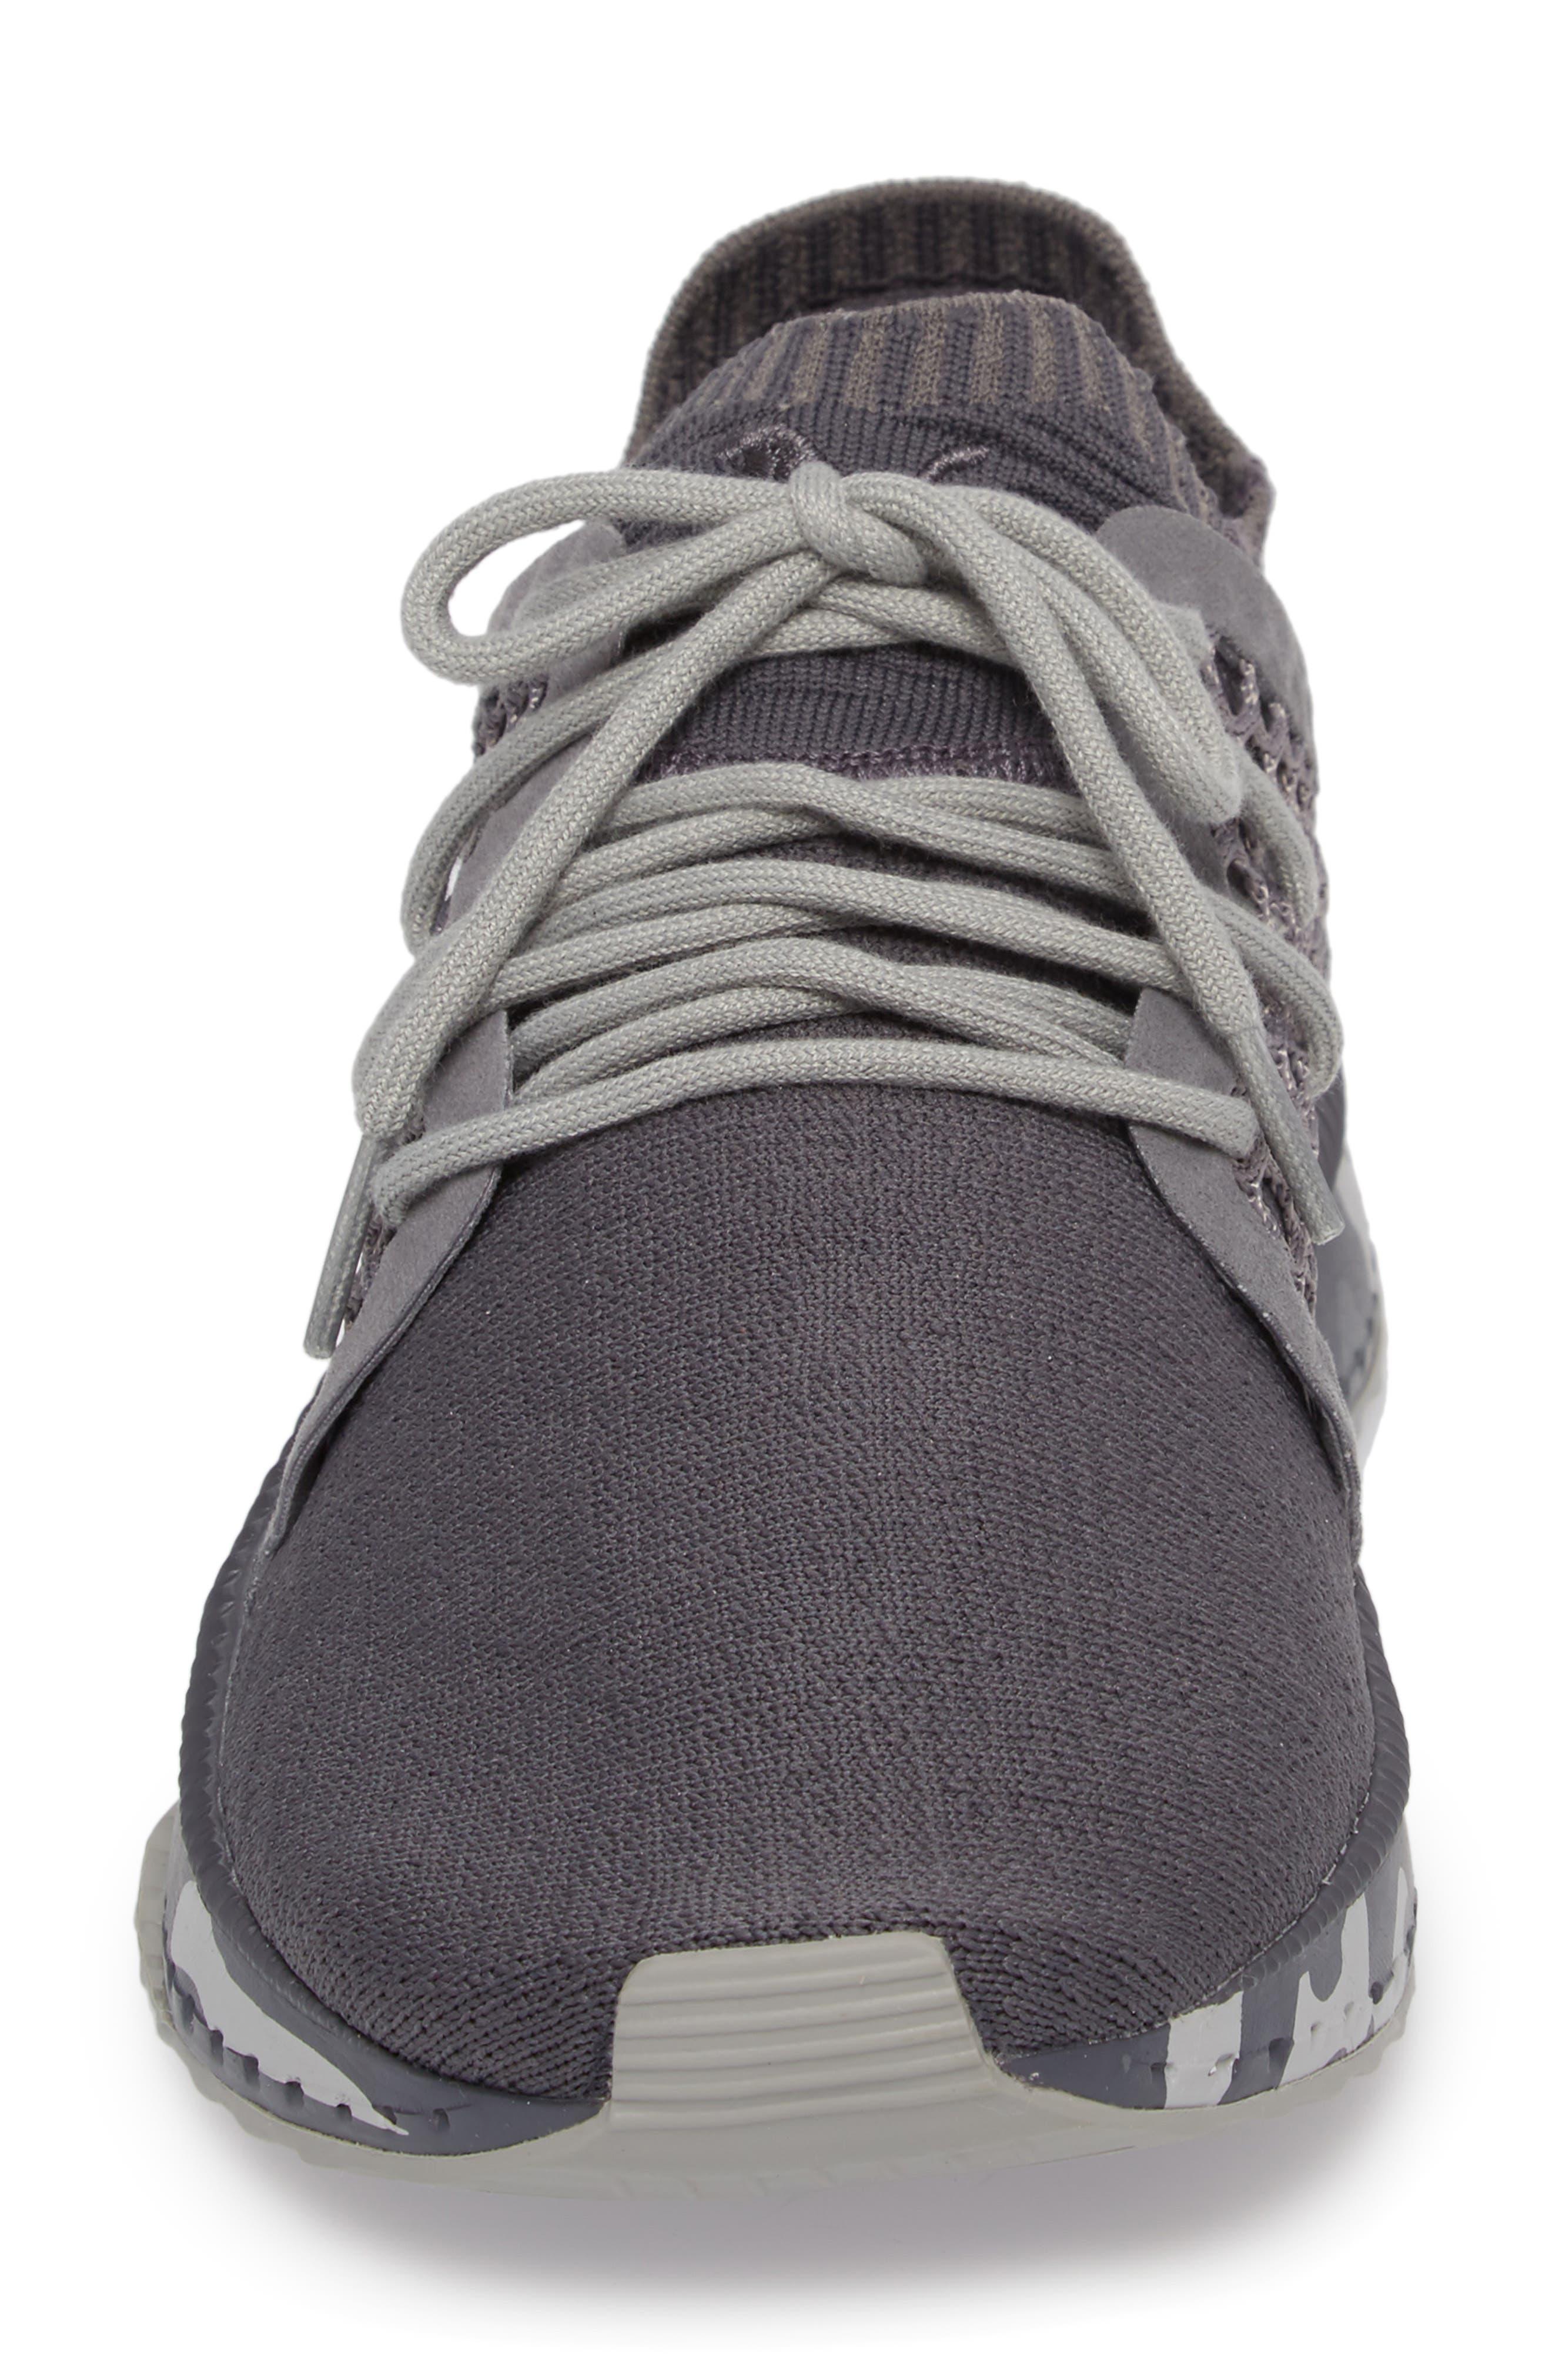 Tsugi Netfit evoKNIT Training Shoe,                             Alternate thumbnail 4, color,                             Quiet Shade-Asphalt